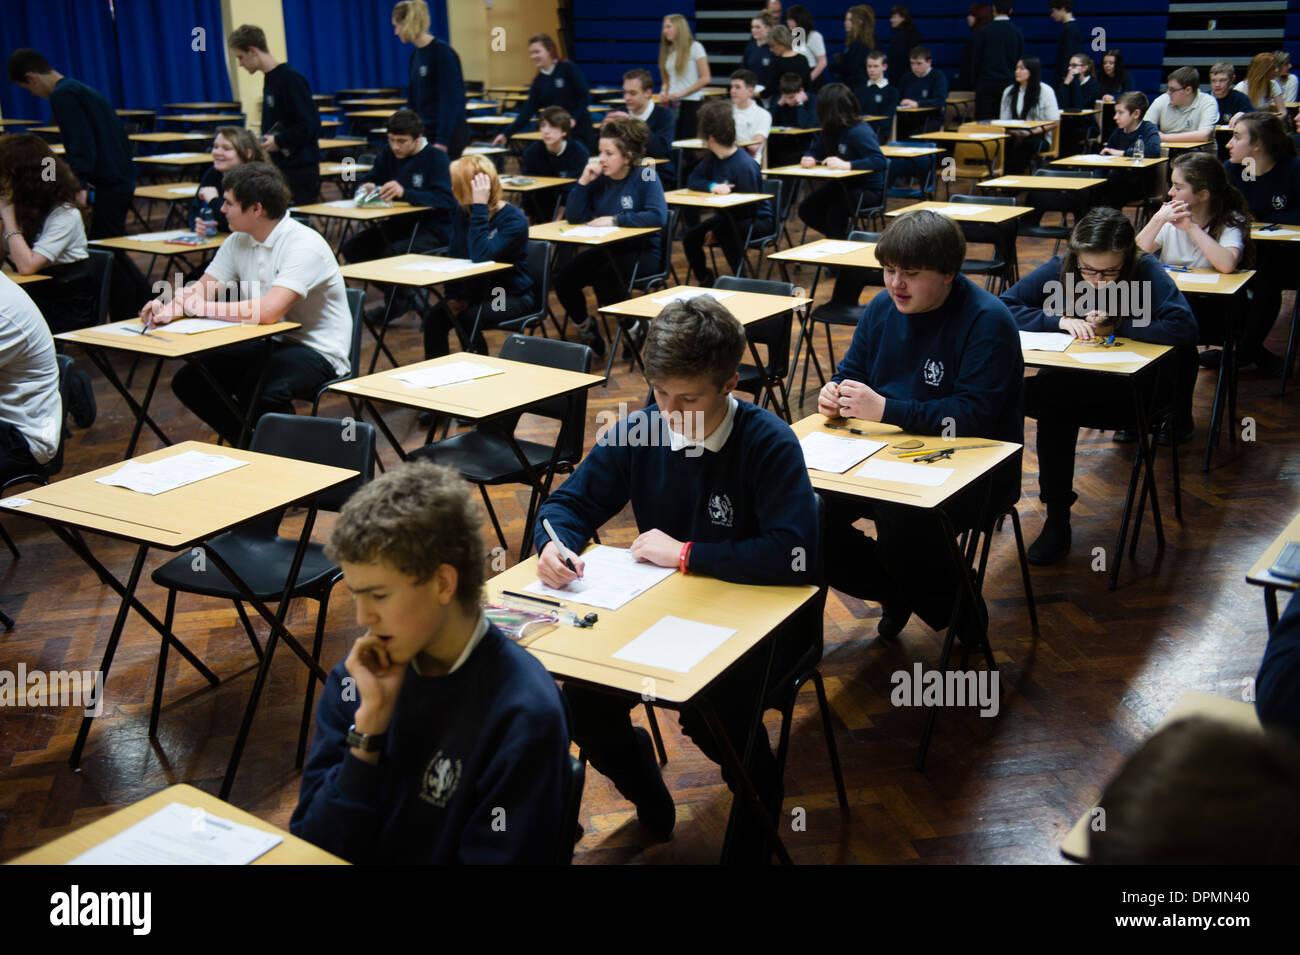 Welsh teenage GCSE school pupils sitting exams in a school hall, Wales UK - Stock Image